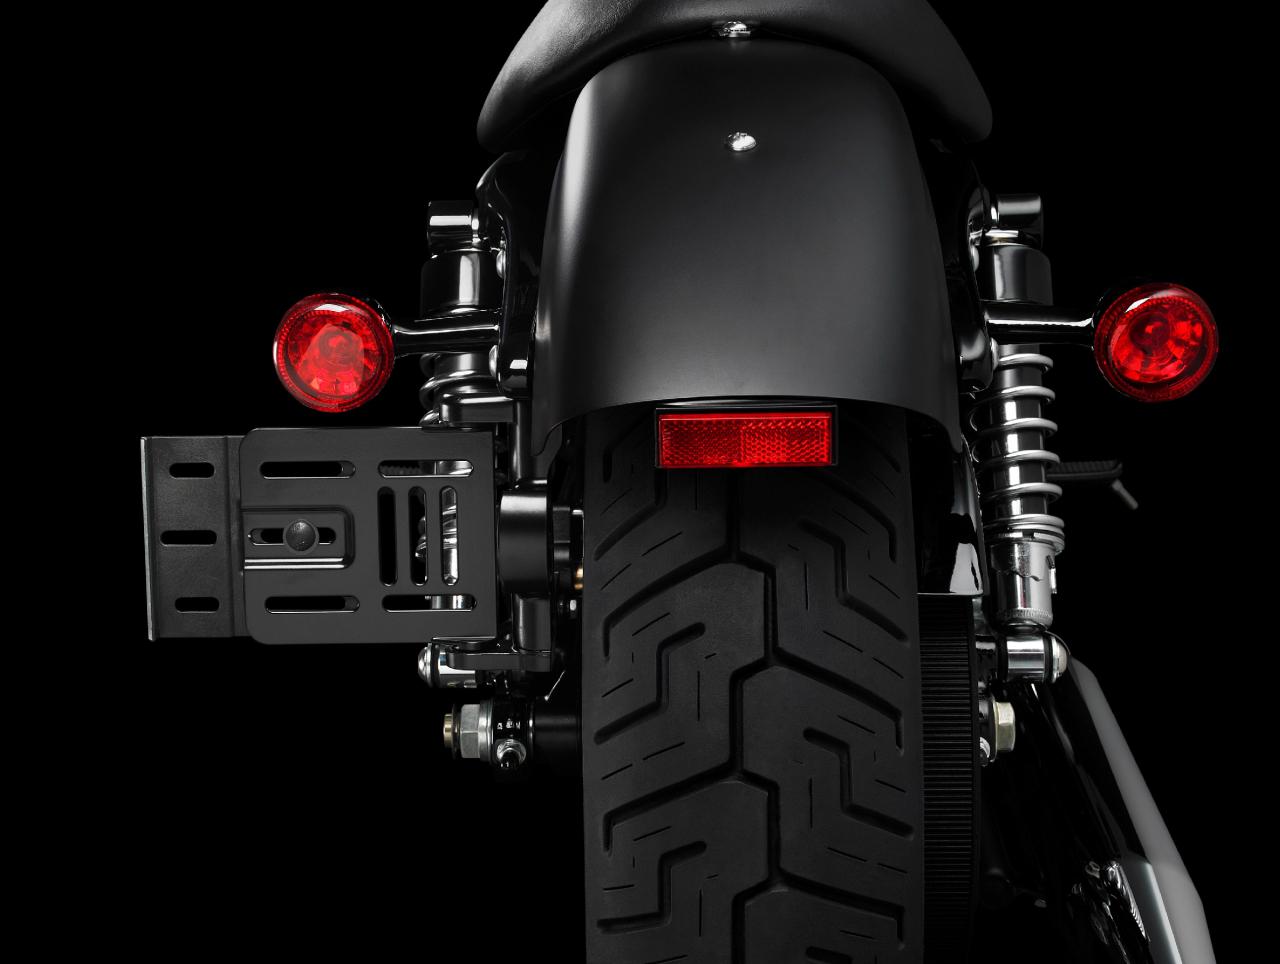 Harley Davidson Iron 883 Sound Harley-davidson Iron 883